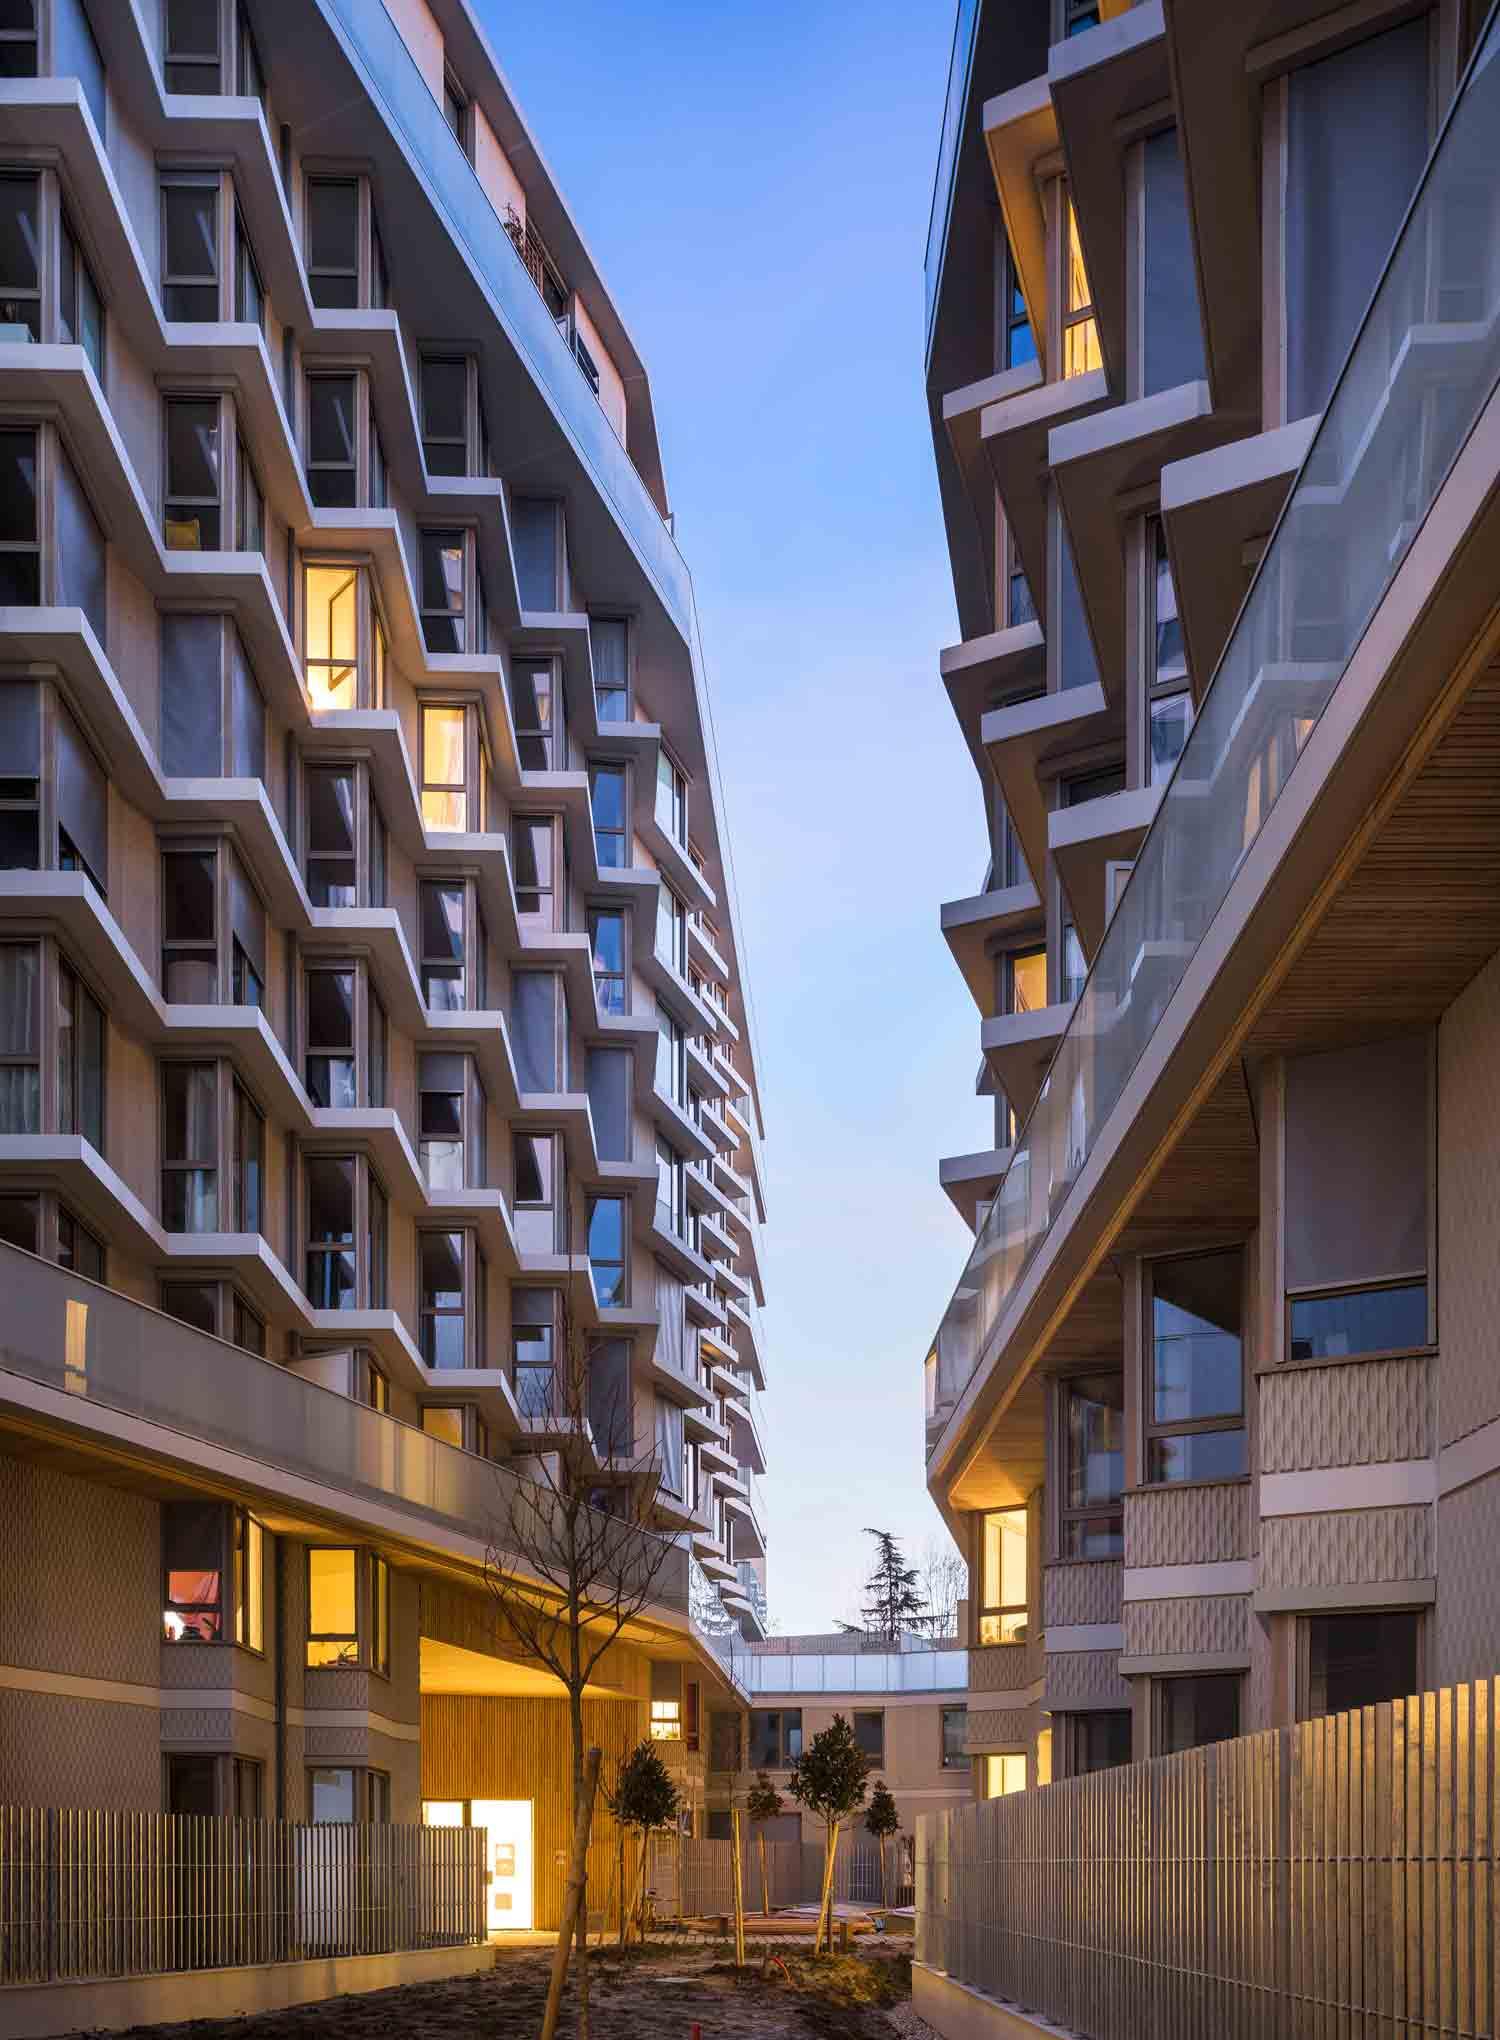 PETITDIDIERPRIOUX Architectes